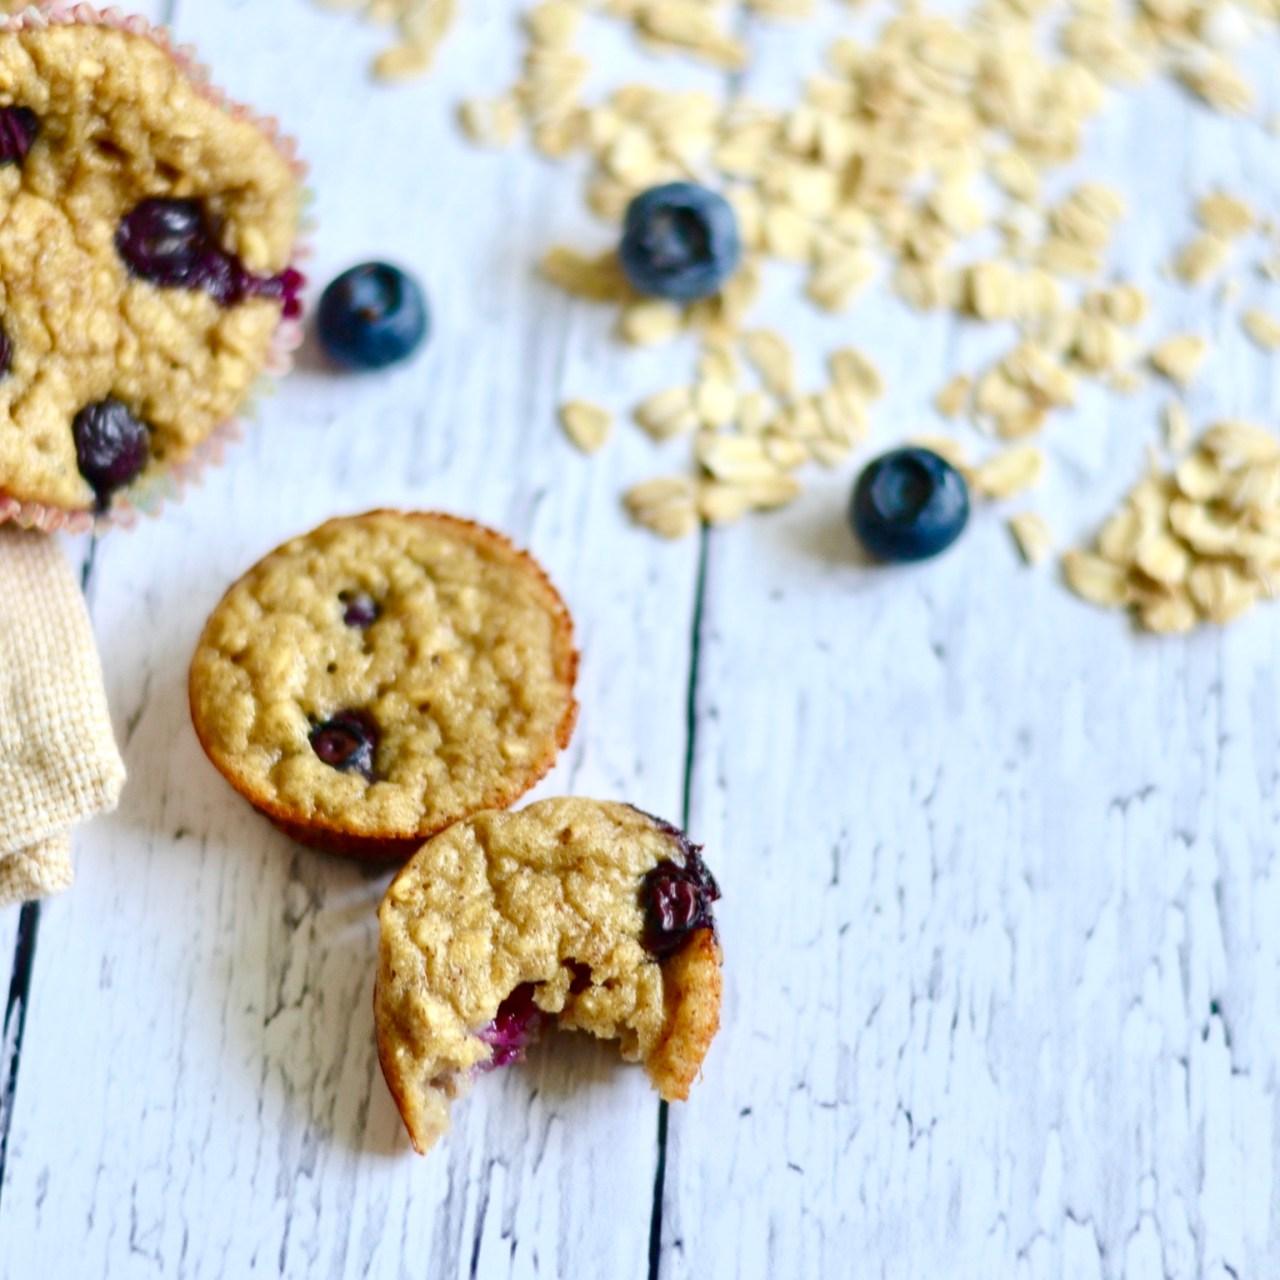 Gluten Free Blueberry Banana Blender Muffins